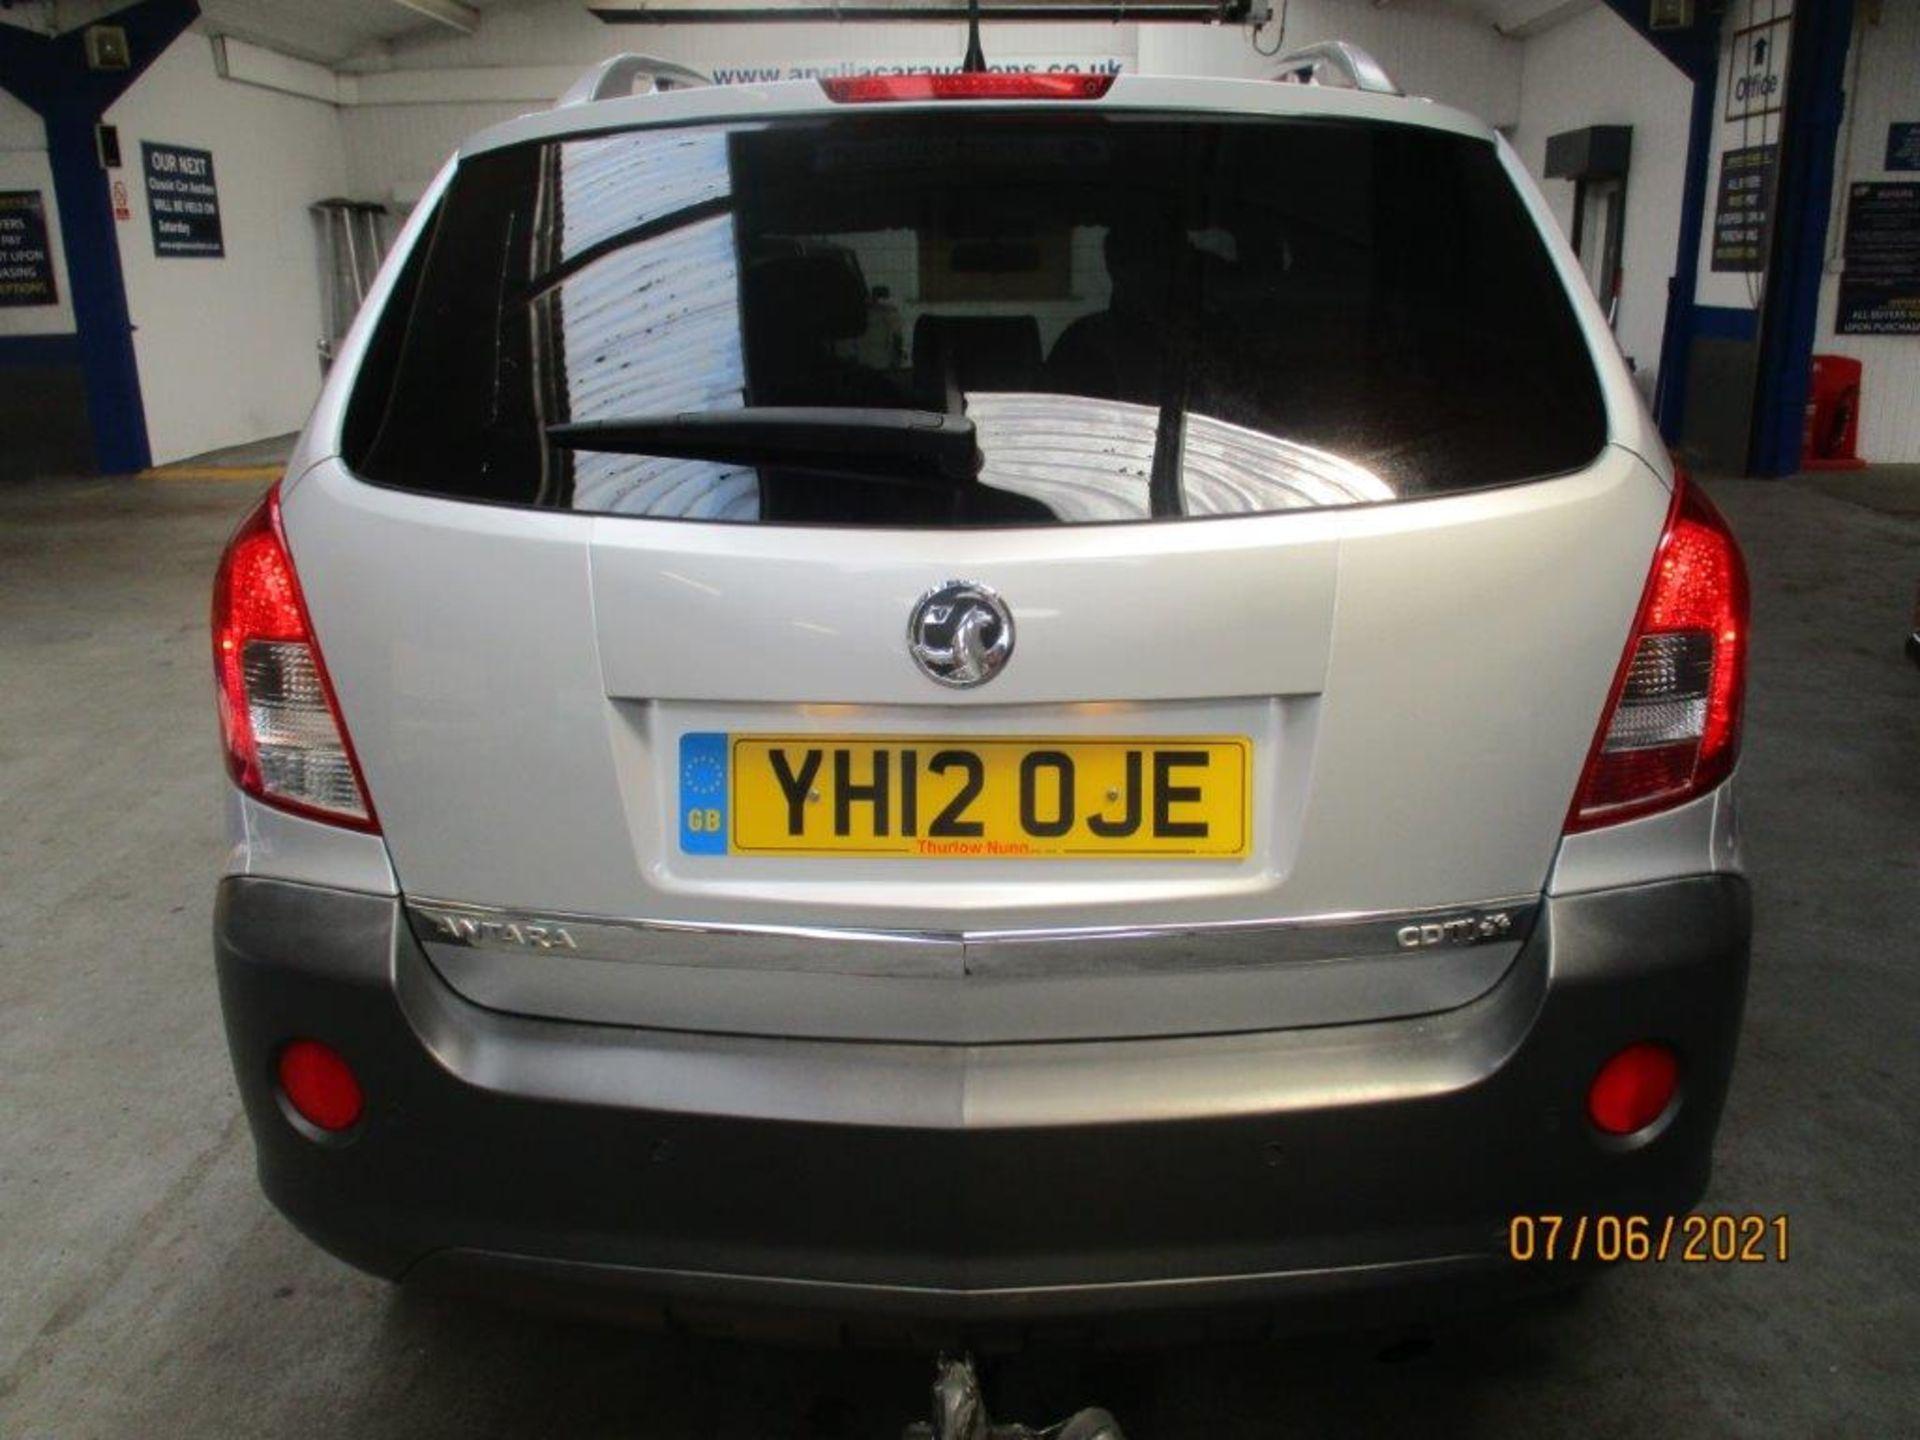 12 12 Vauxhall Antara Excl CDTI - Image 4 of 18